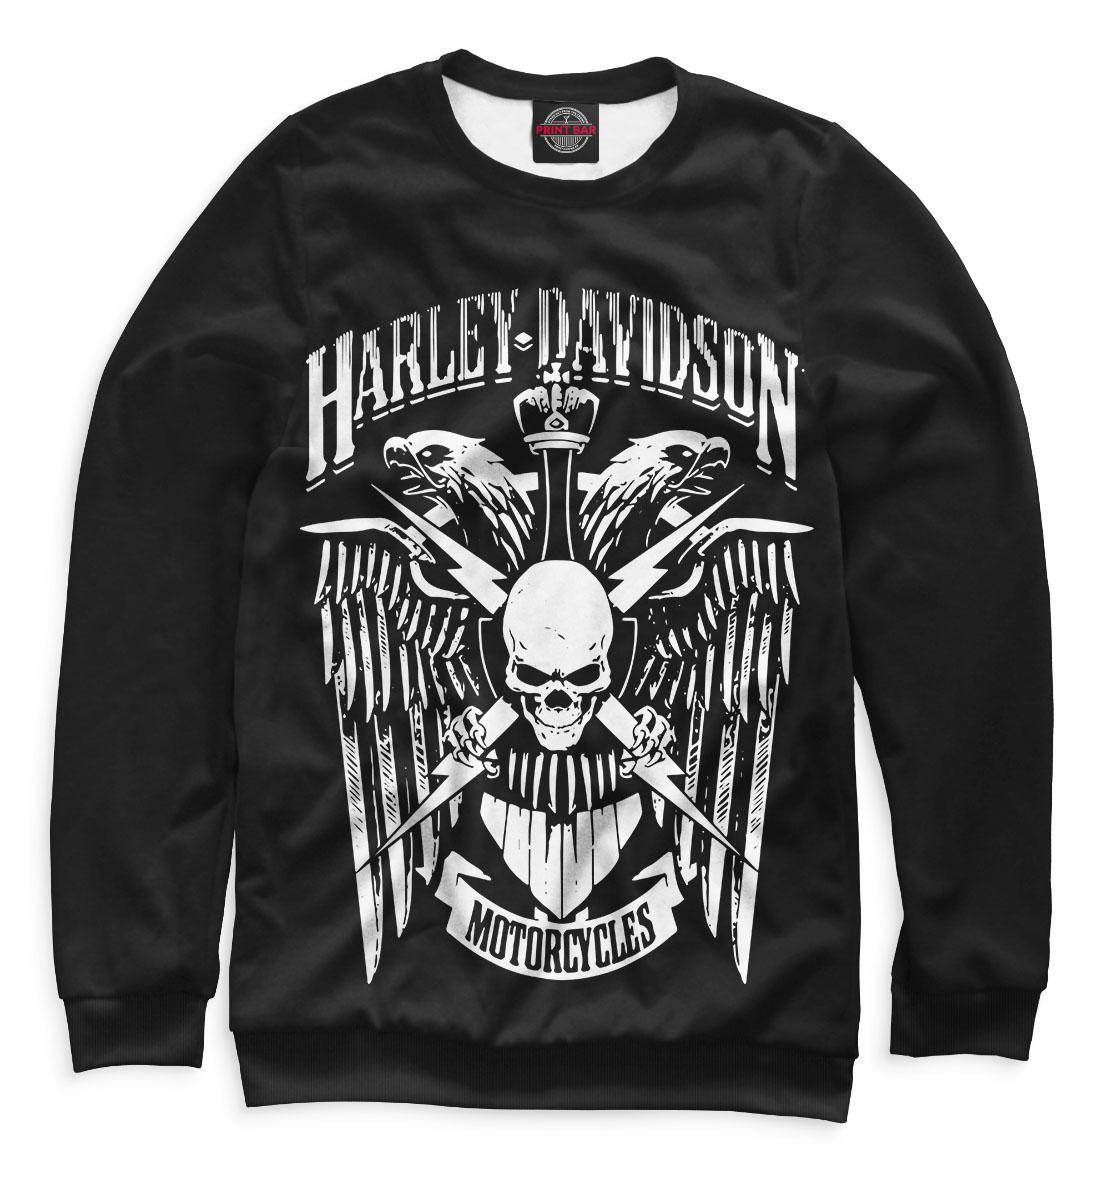 Купить Harley Davidson Motorcycles, Printbar, Свитшоты, MTR-575884-swi-2